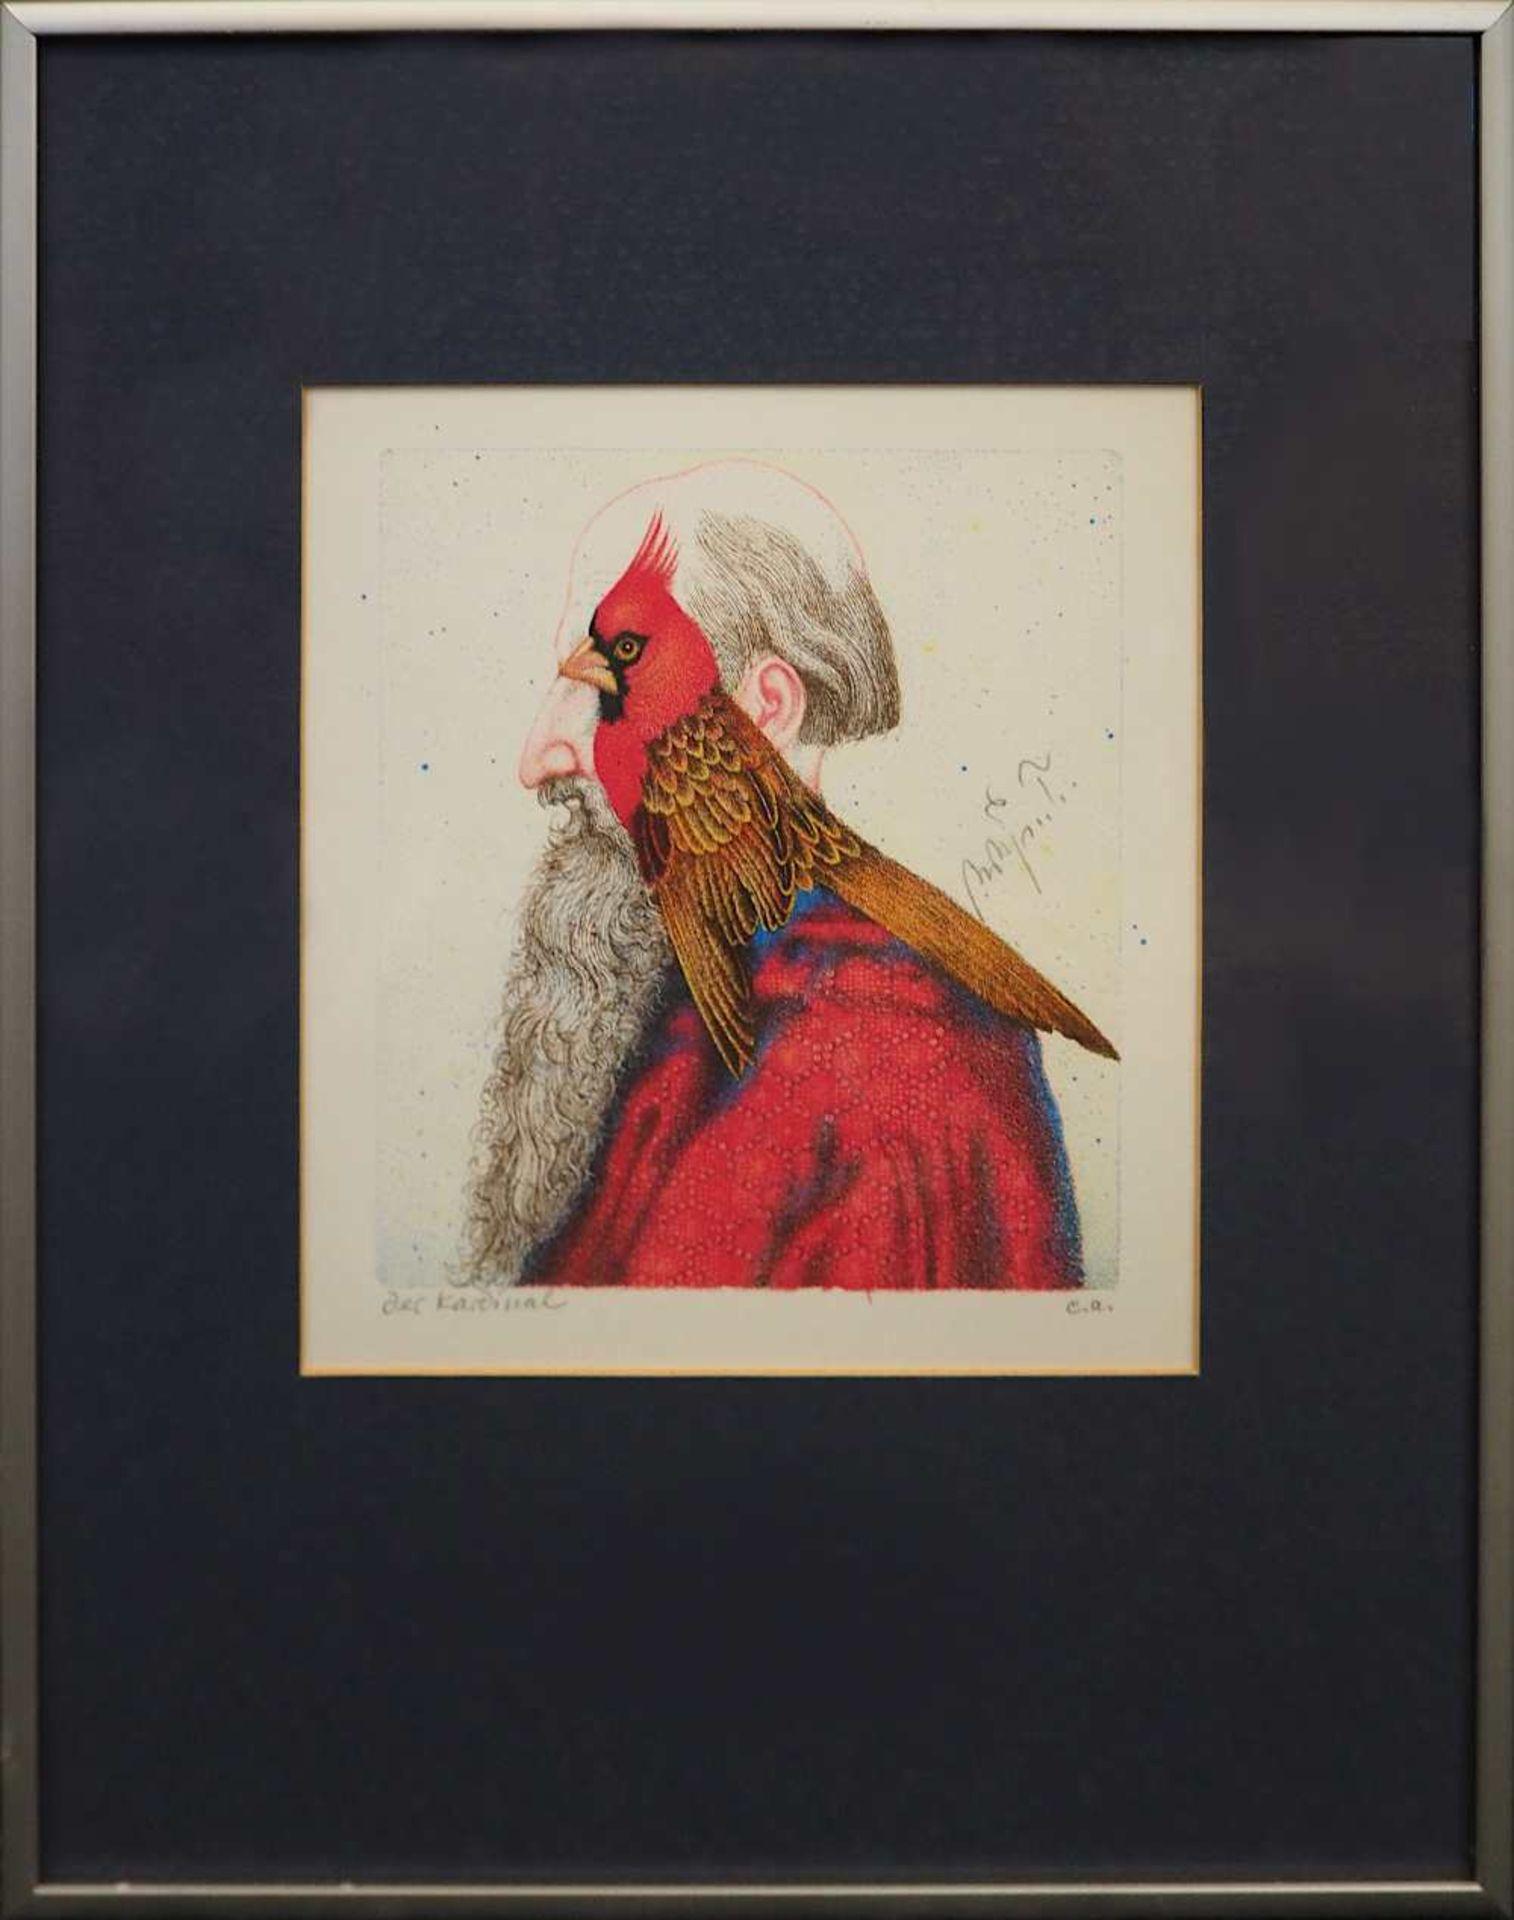 1 Farblithografie Mitte rechts bleistiftsign. M. M. PRECHTL (wohl Michael Mathias P. 1926-2003), - Bild 2 aus 4